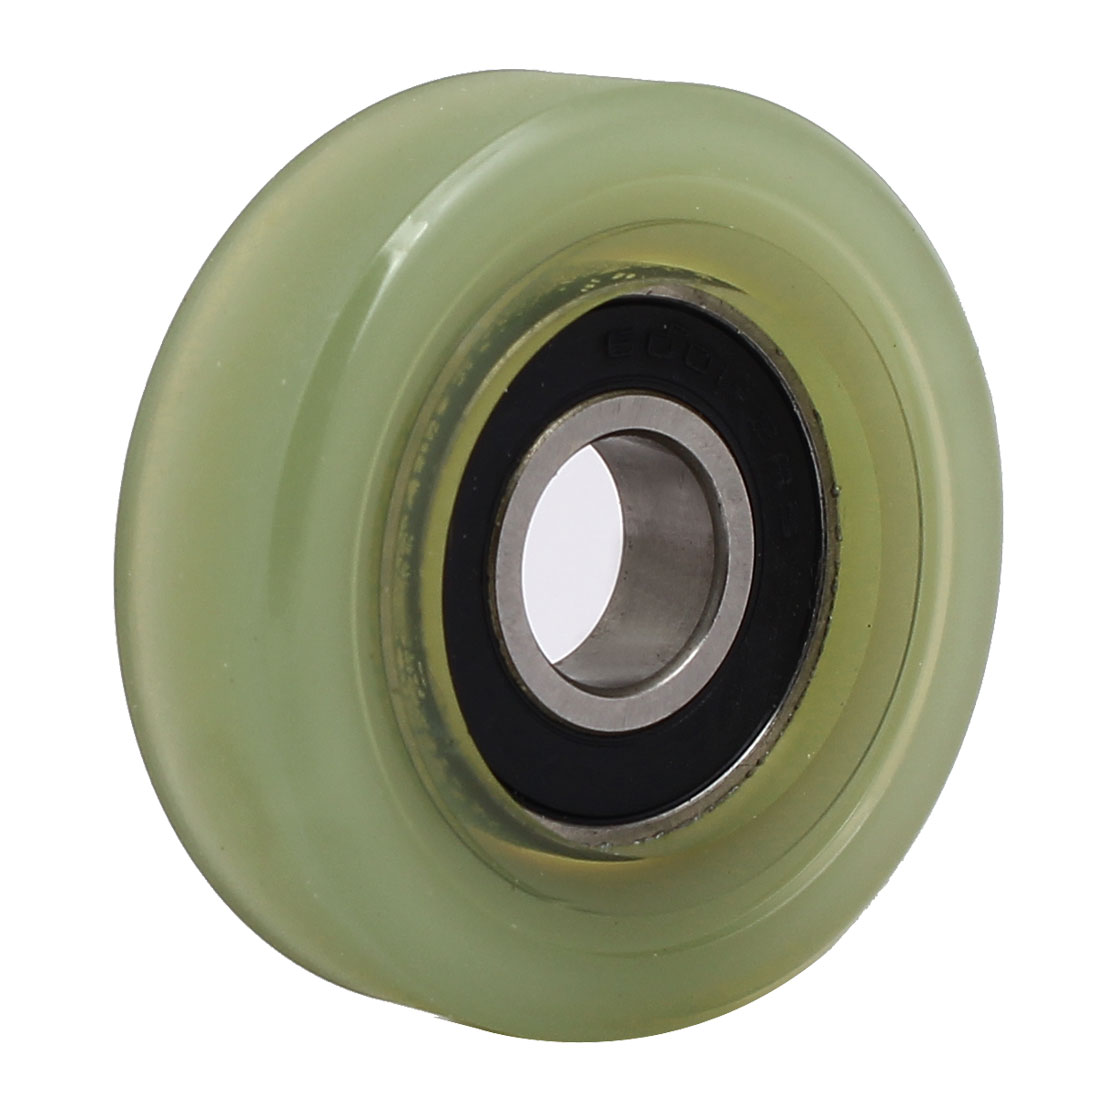 12mm x 45mm x 14mm PU Roller Bearing Pulley Sliding Converyor Wheel